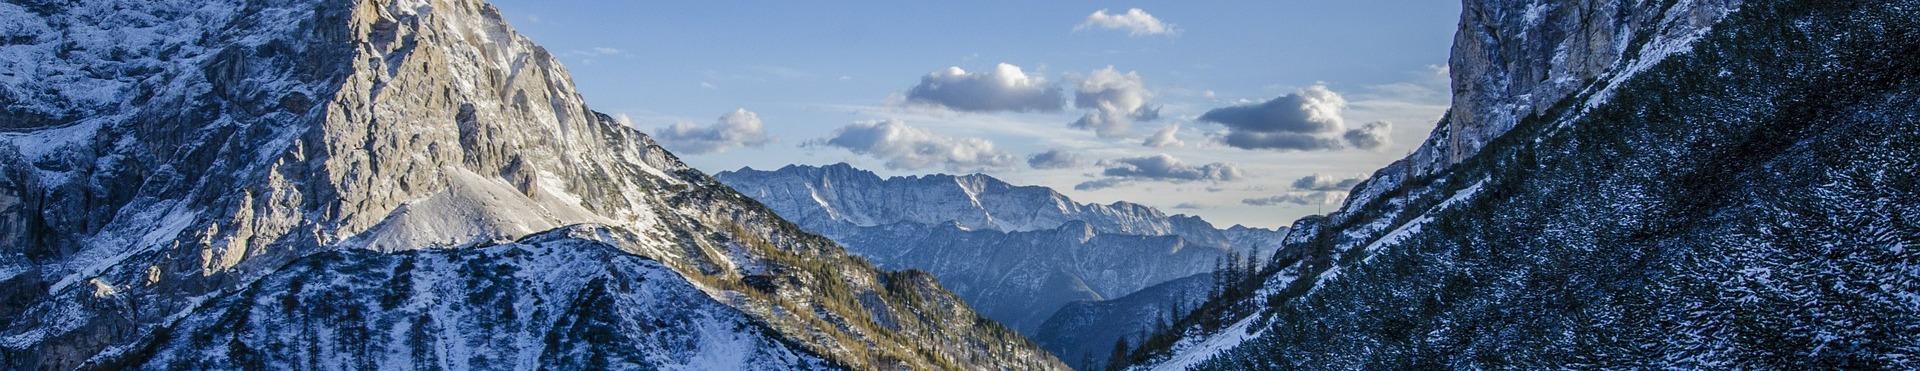 Kanada Rockymountain Aussicht Berge